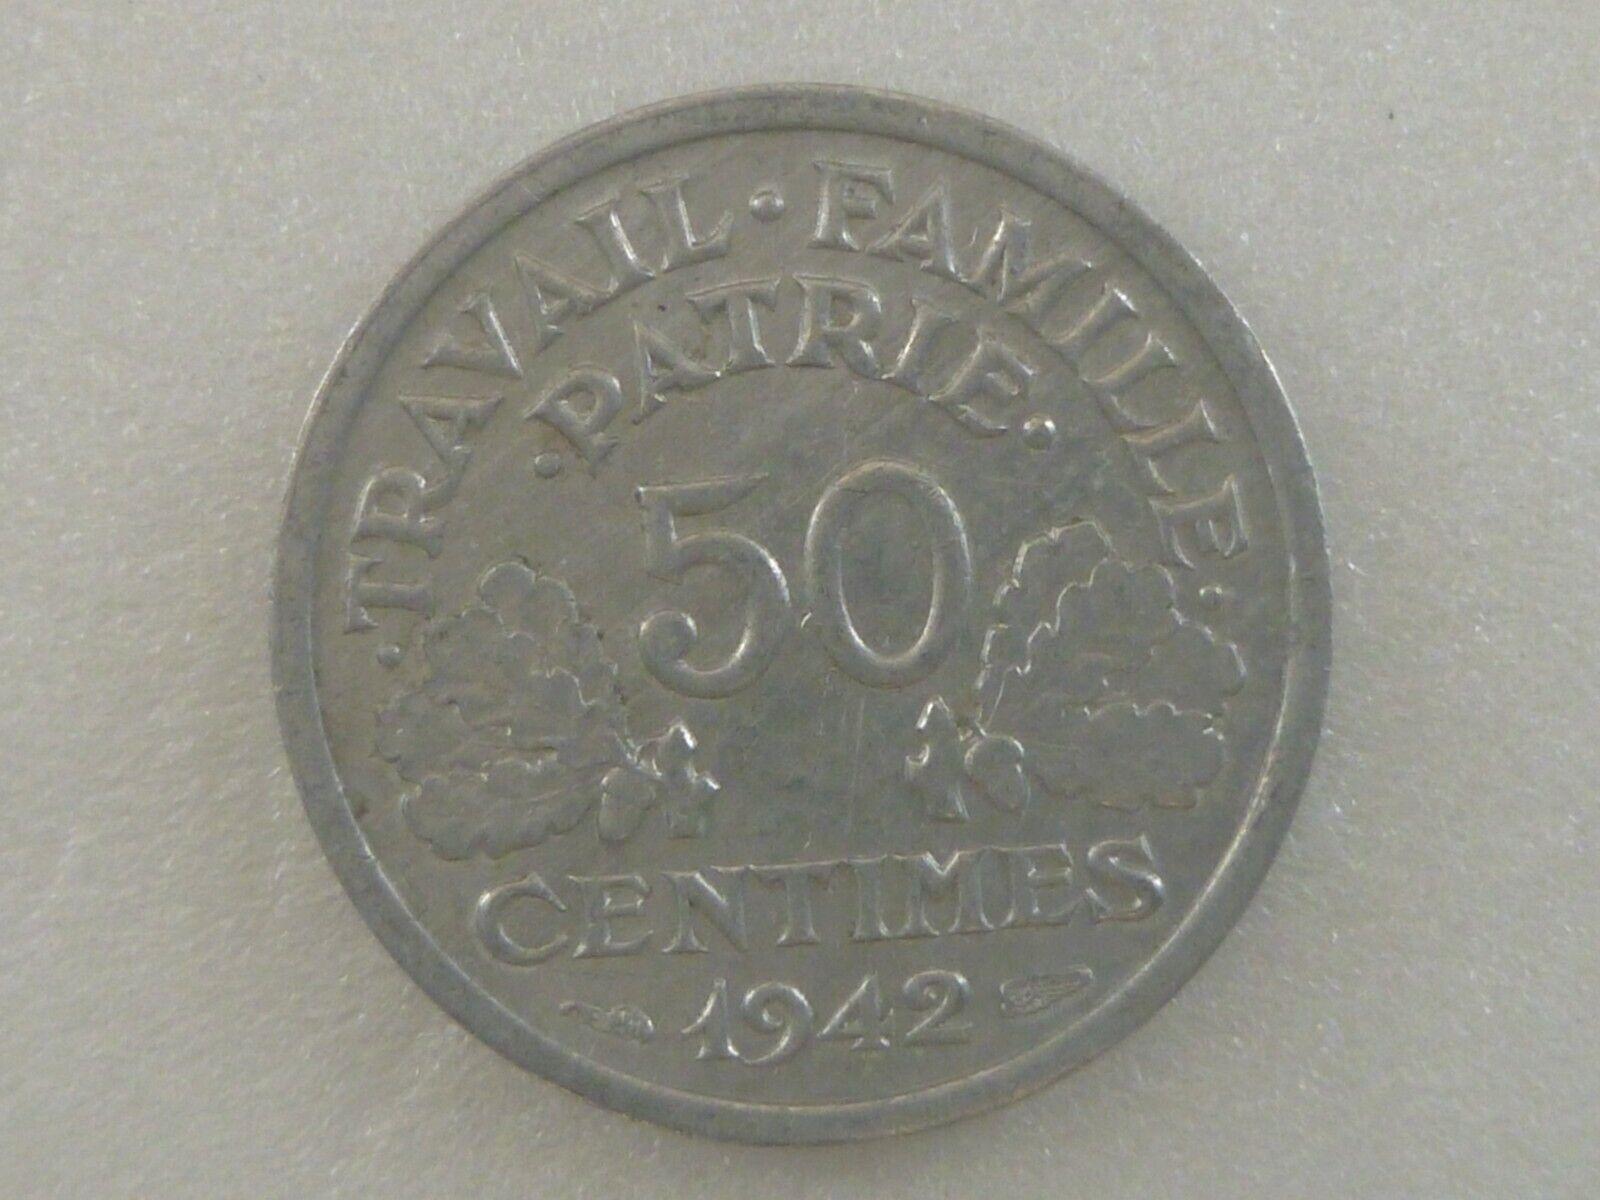 FRANCE 50 centimes -1942- aluminium FDC/UNC